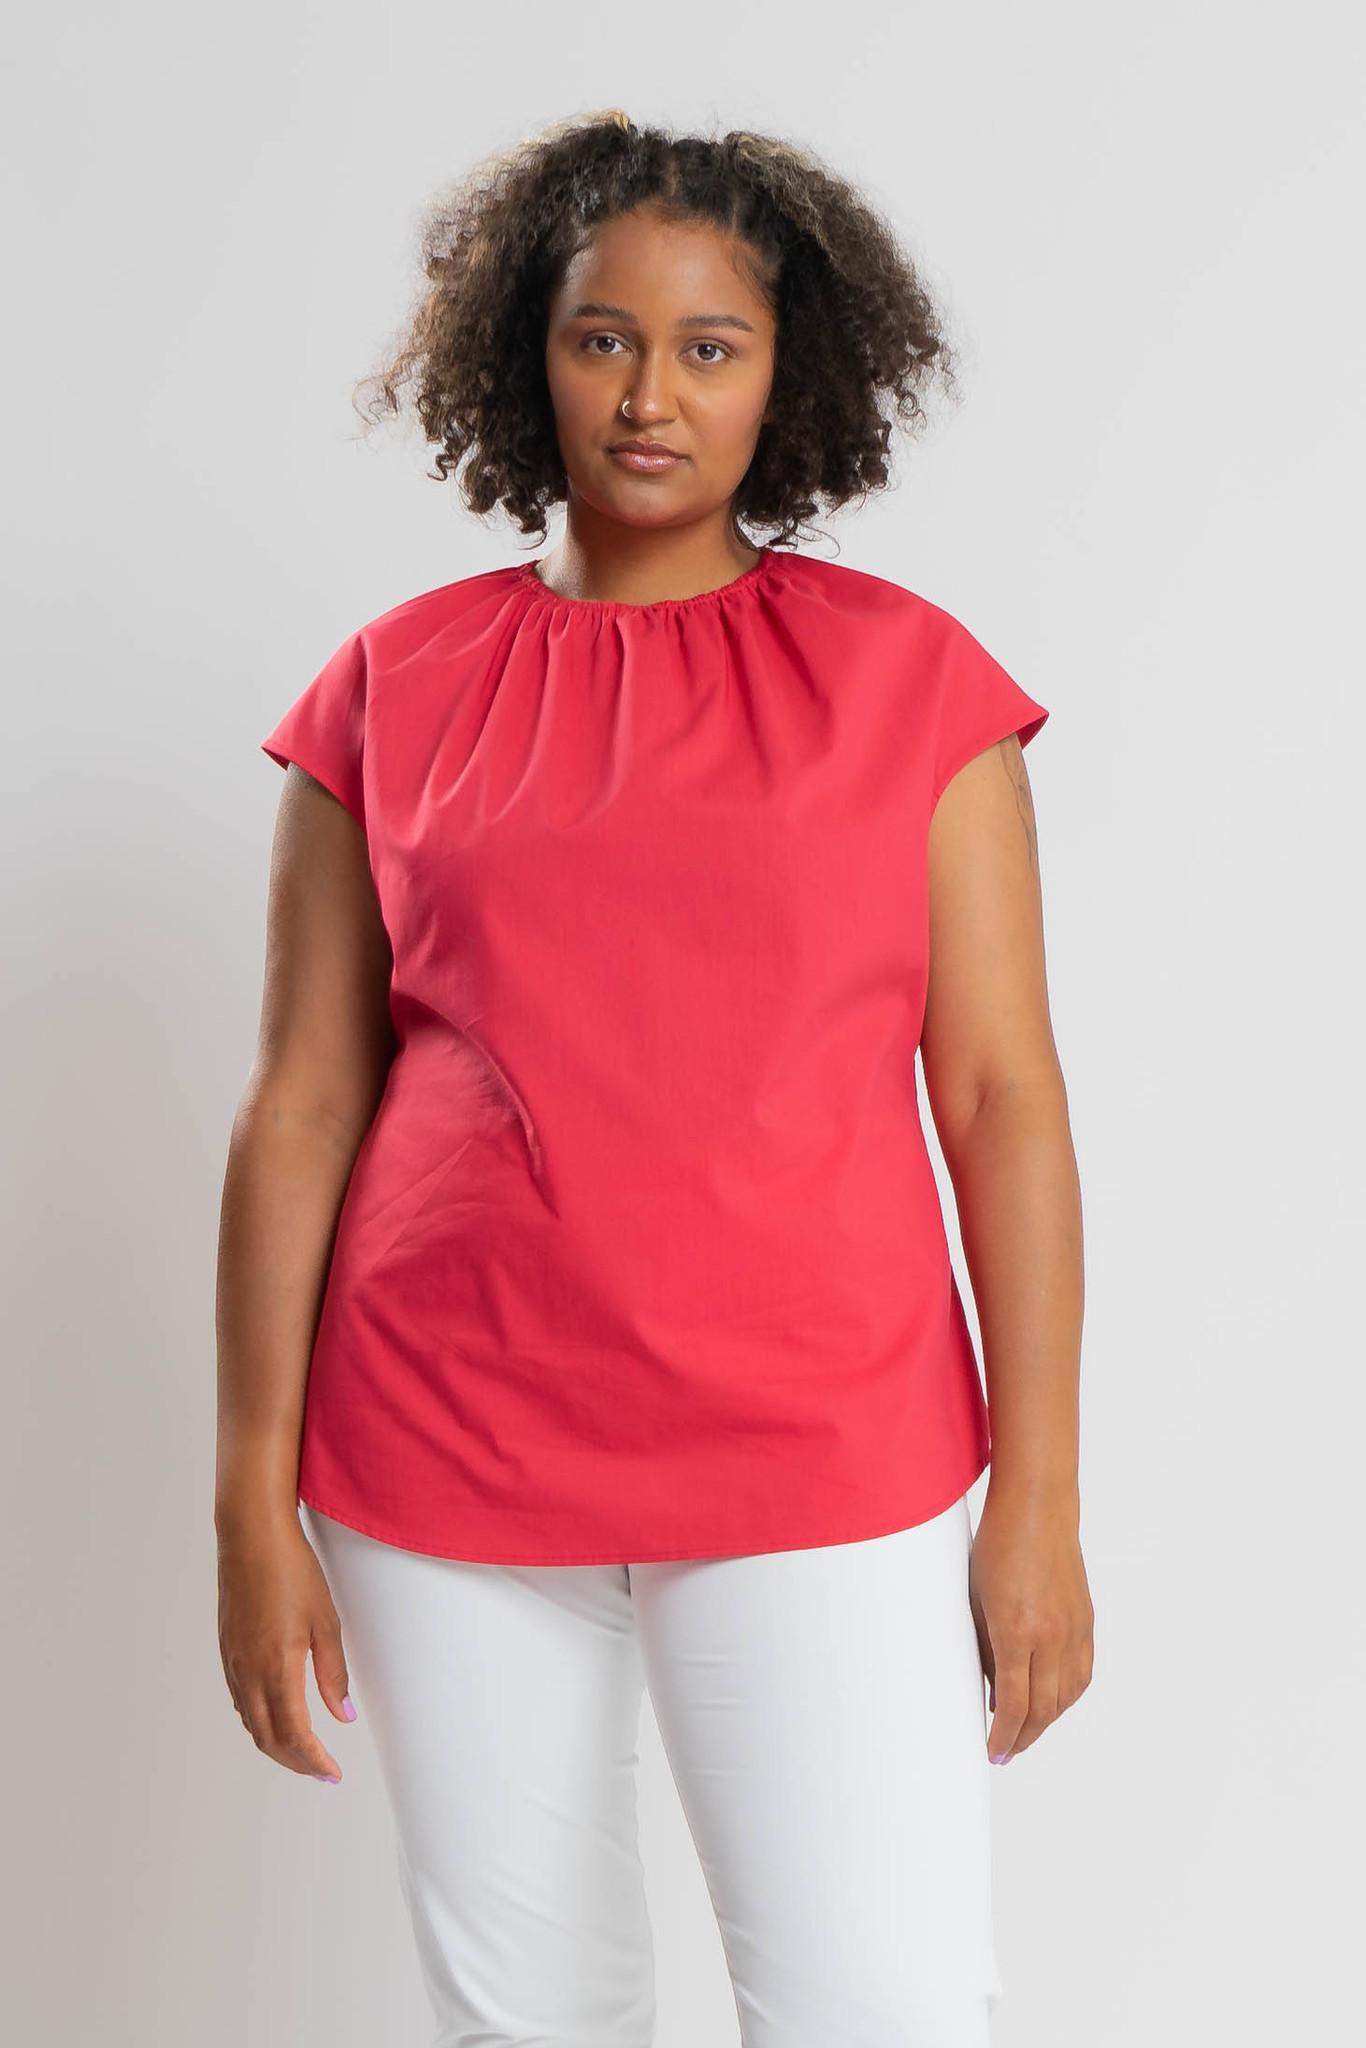 ANZU Shirt aus Bauwoll-Stretch-1